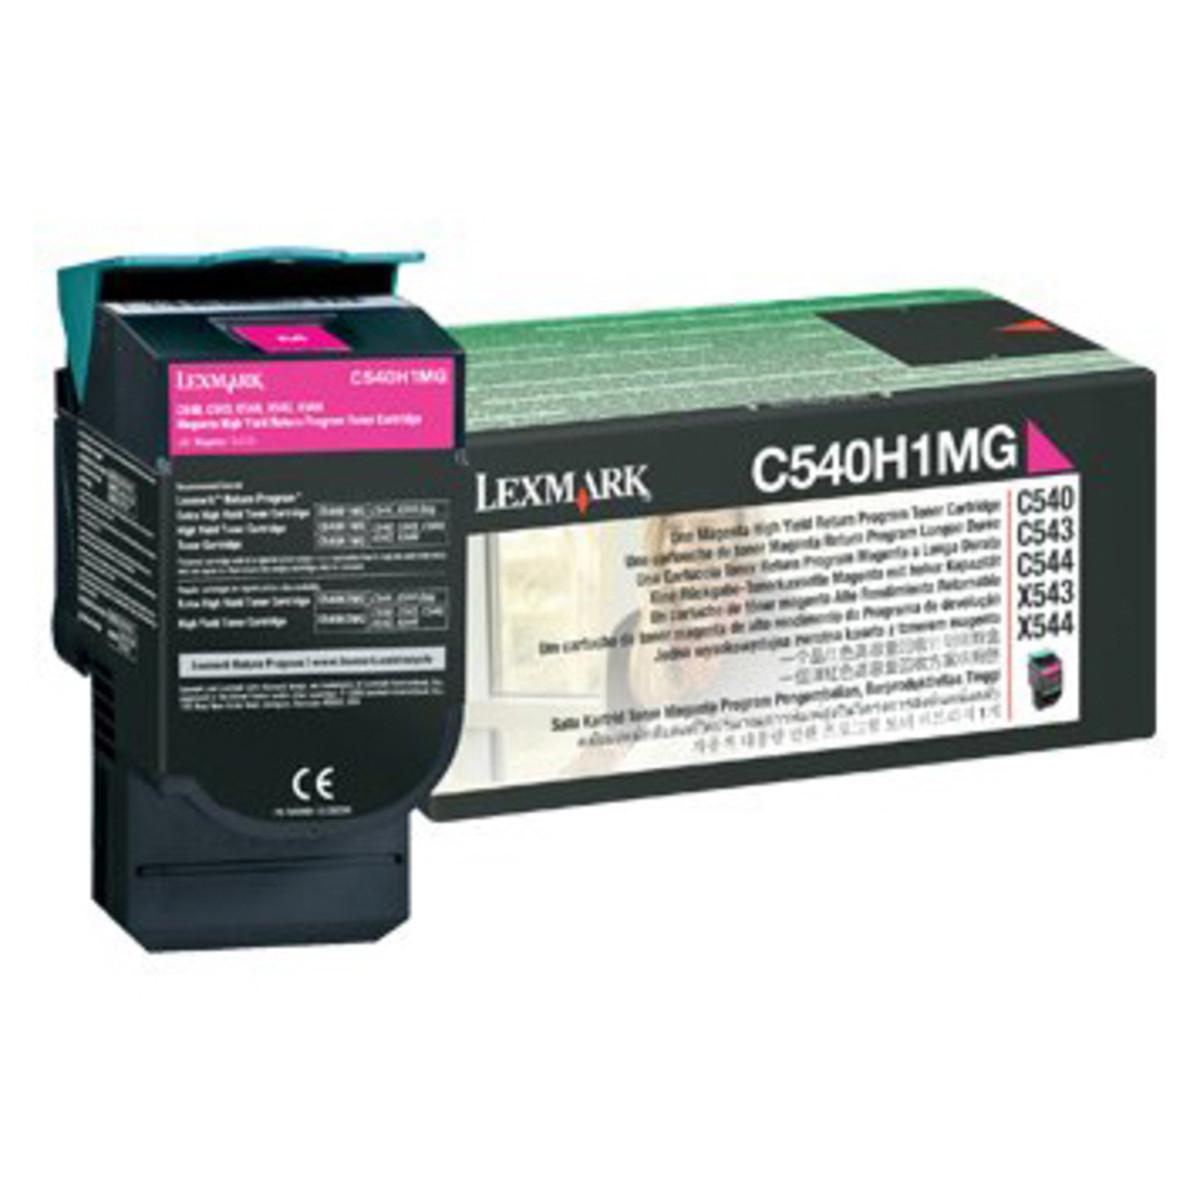 Lexmark C540H1MG Magenta Toner Cartridge - High Yield